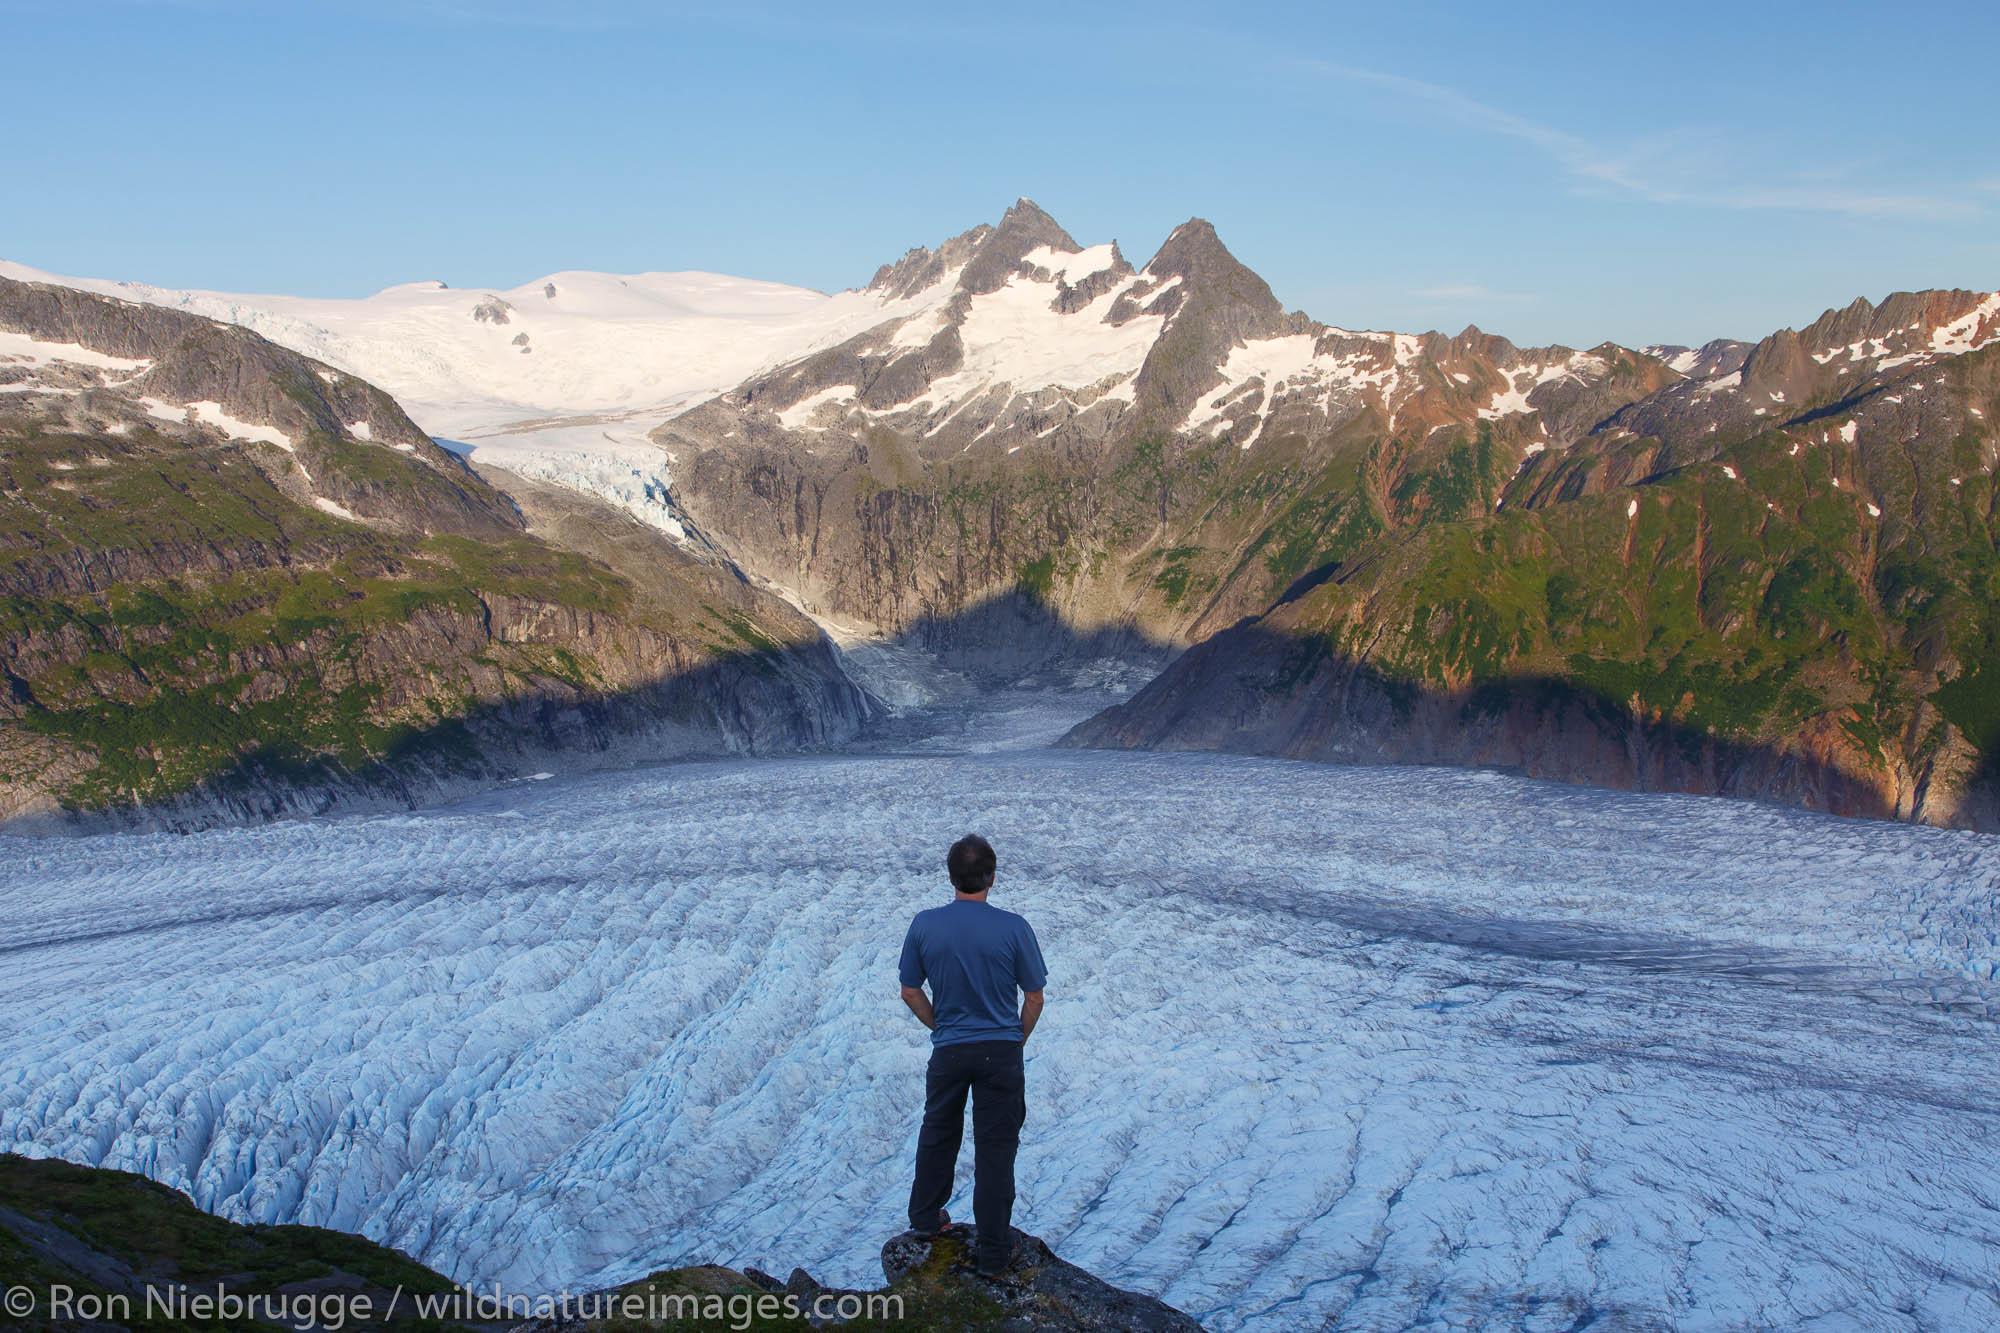 A hiker on Mount Stroller White above the Mendenhall Glacier, Tongass National Forest, Alaska. (model released)